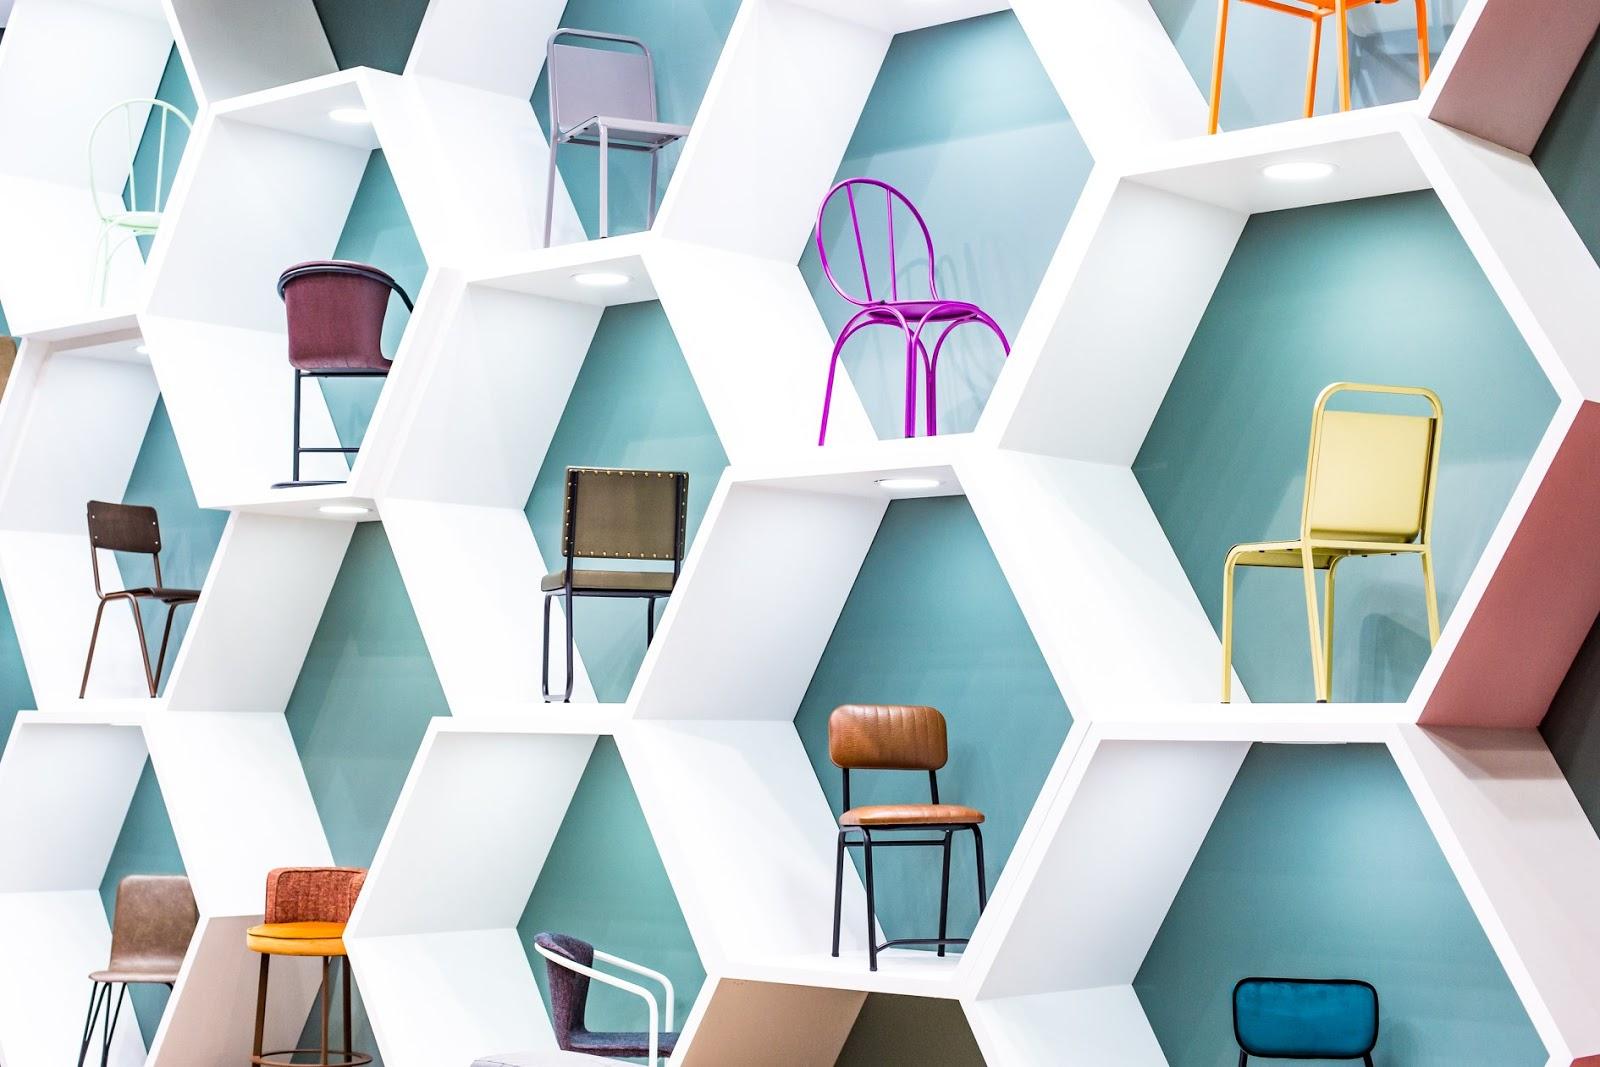 Il salone del mobile 2018 for Il salone del mobile